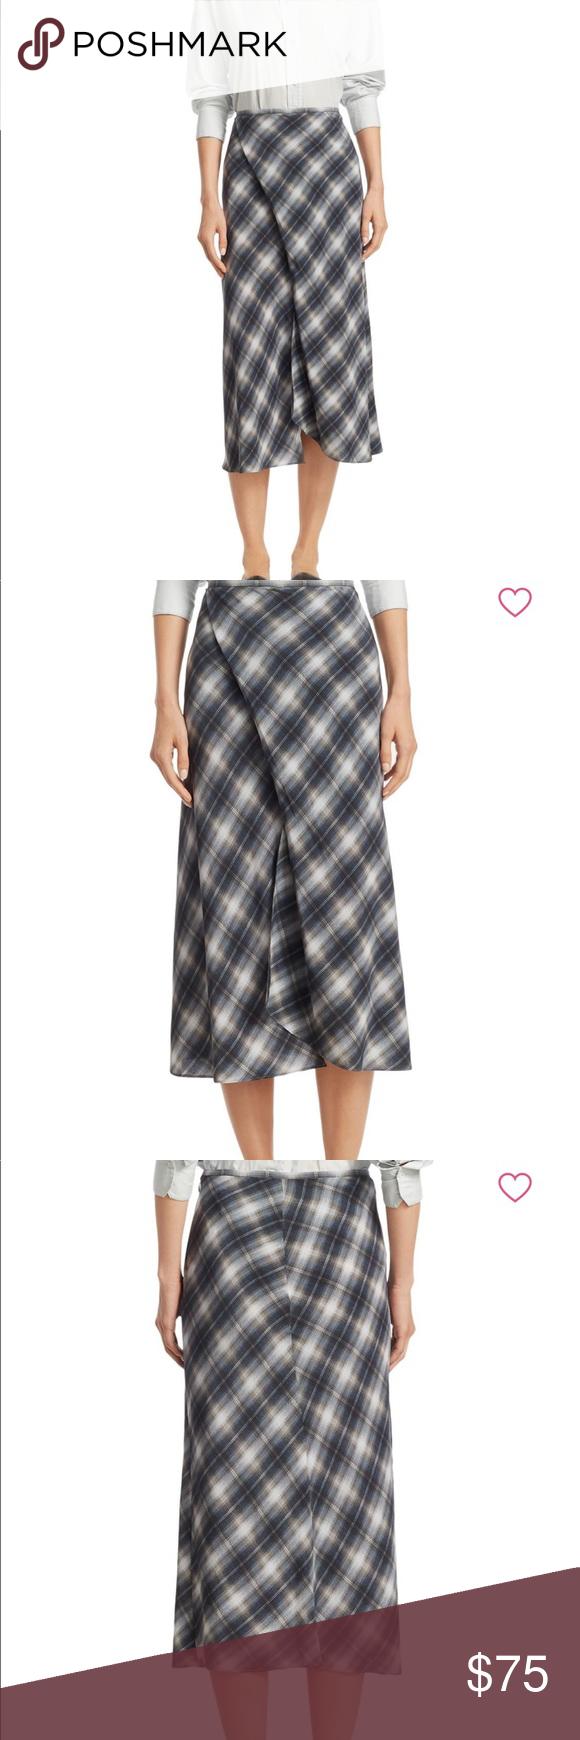 68bace34399889 Vince shadow plaid silk draped skirt Size 4 Lightly worn Vince Skirts Midi